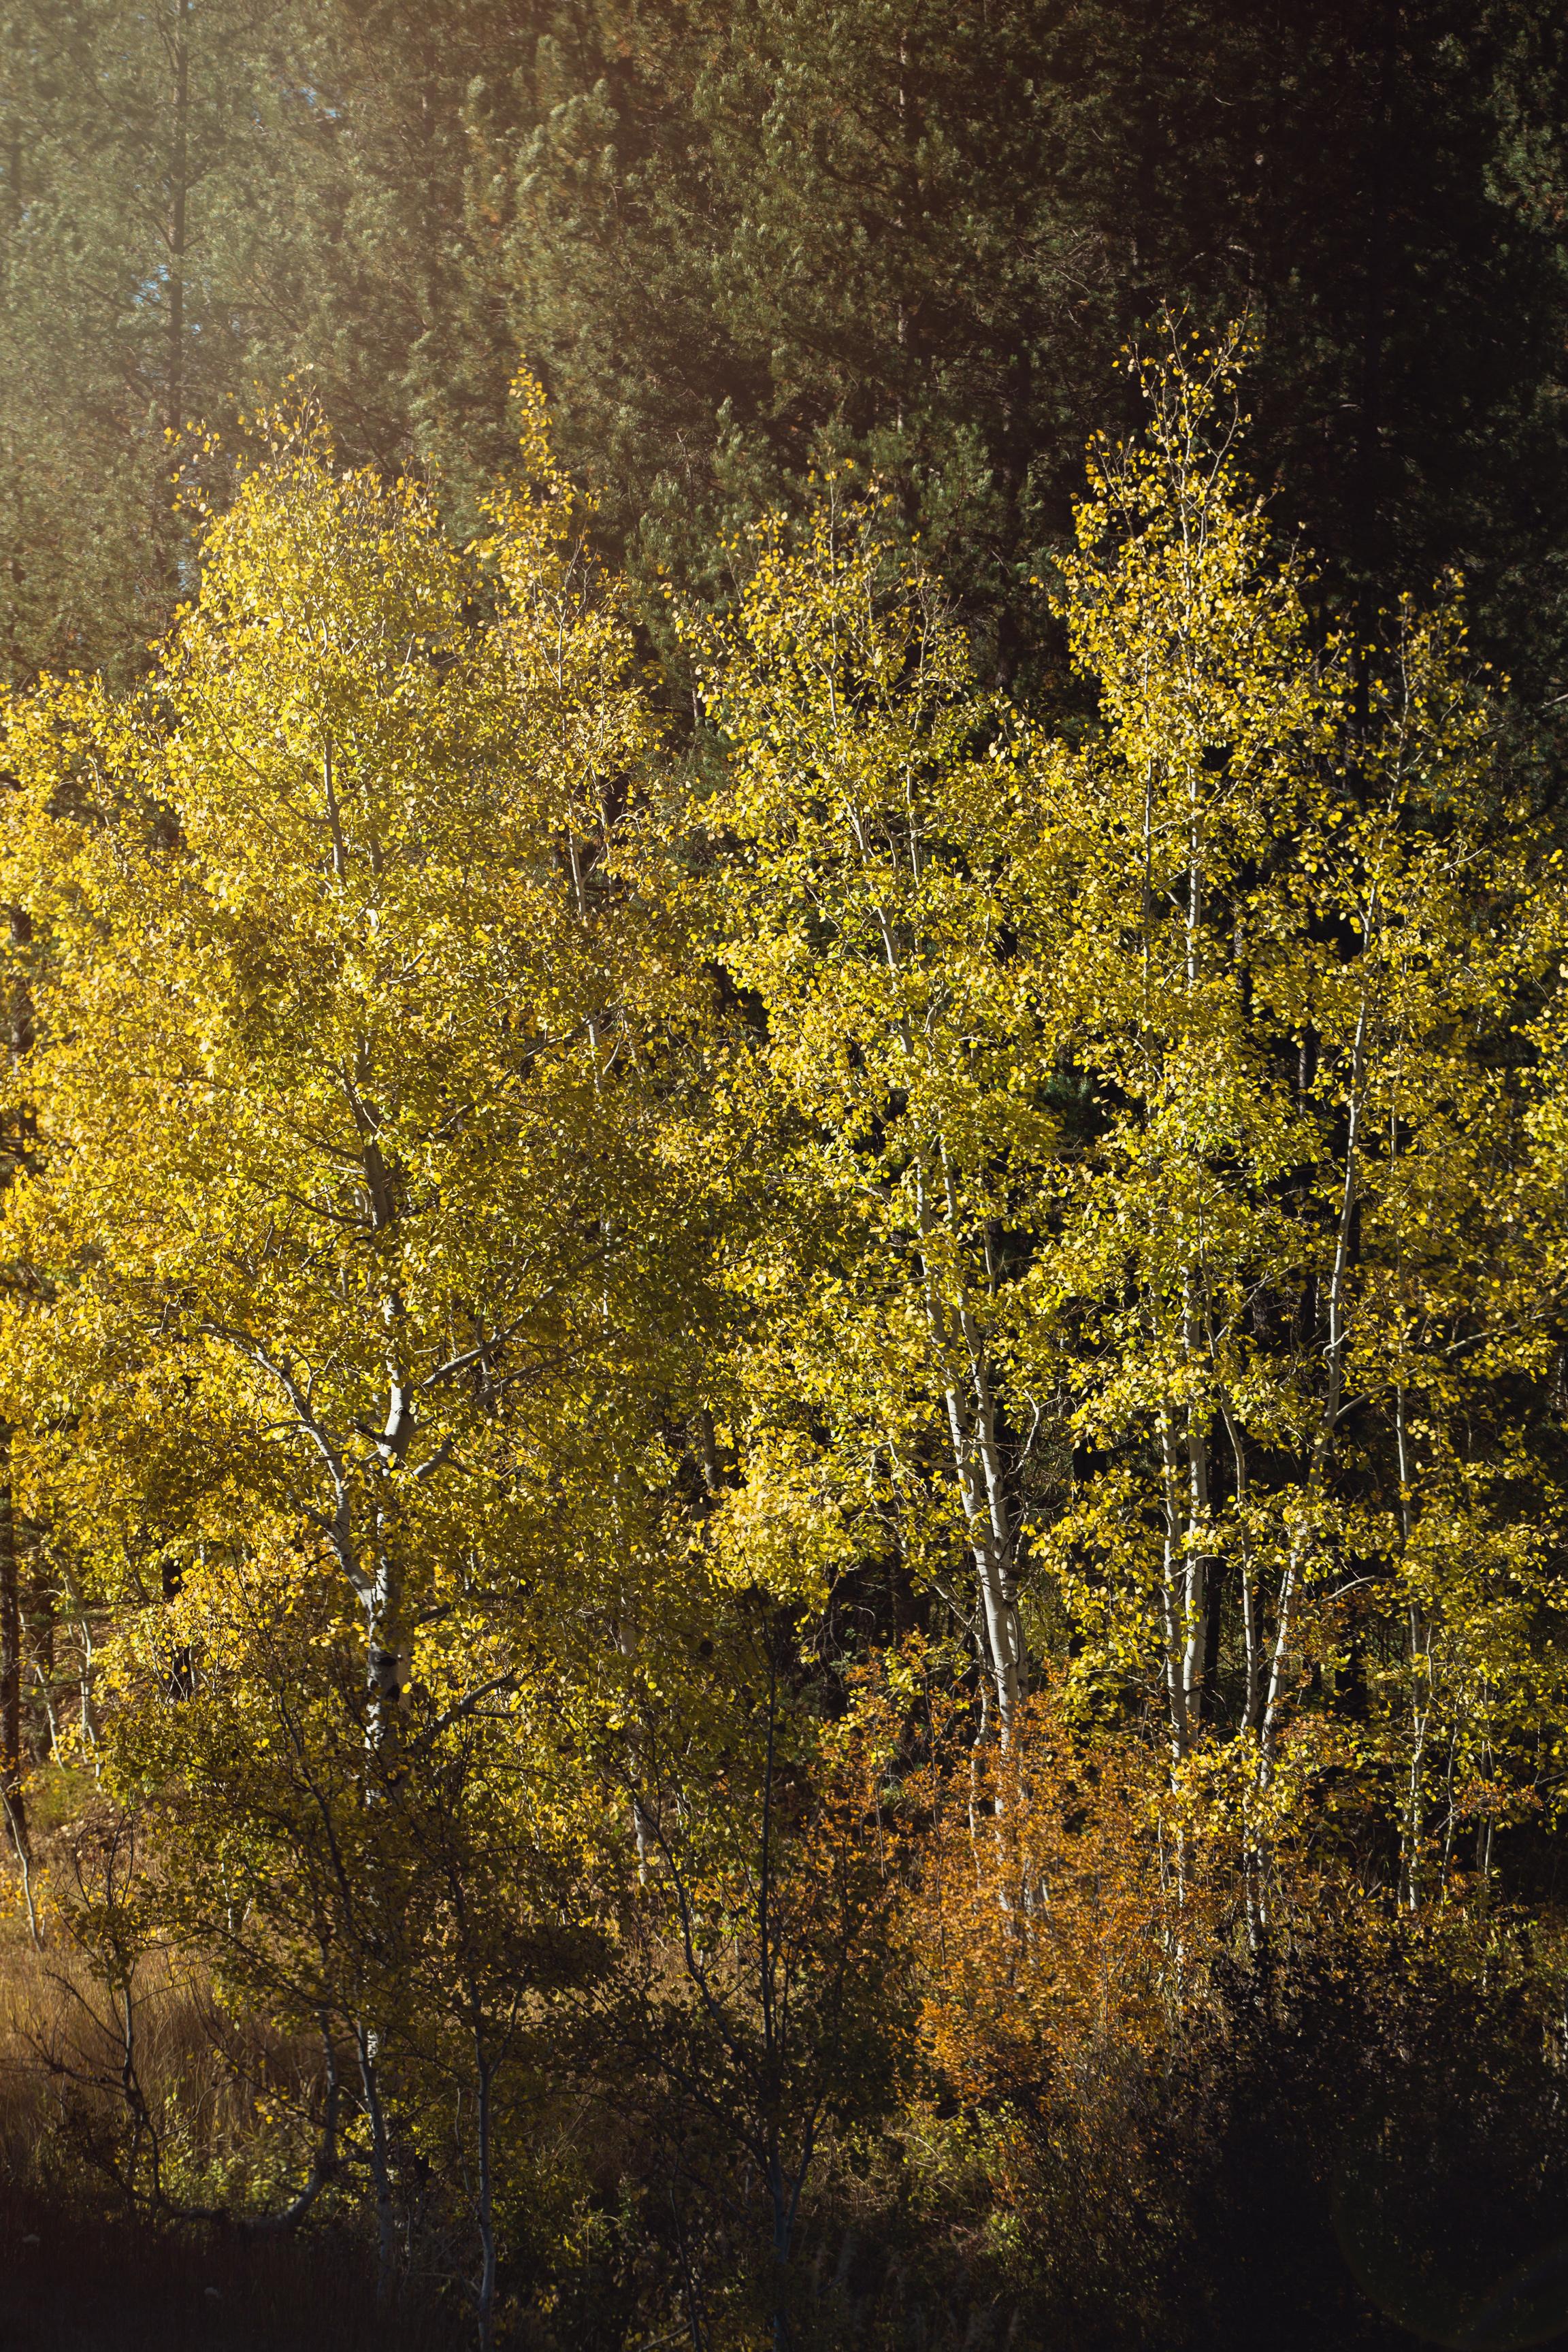 Cindy_Giovagnoli_Idaho_Wyoming_Grand_Teton_National_Park_autumn_aspens_camping_mountains-019.jpg